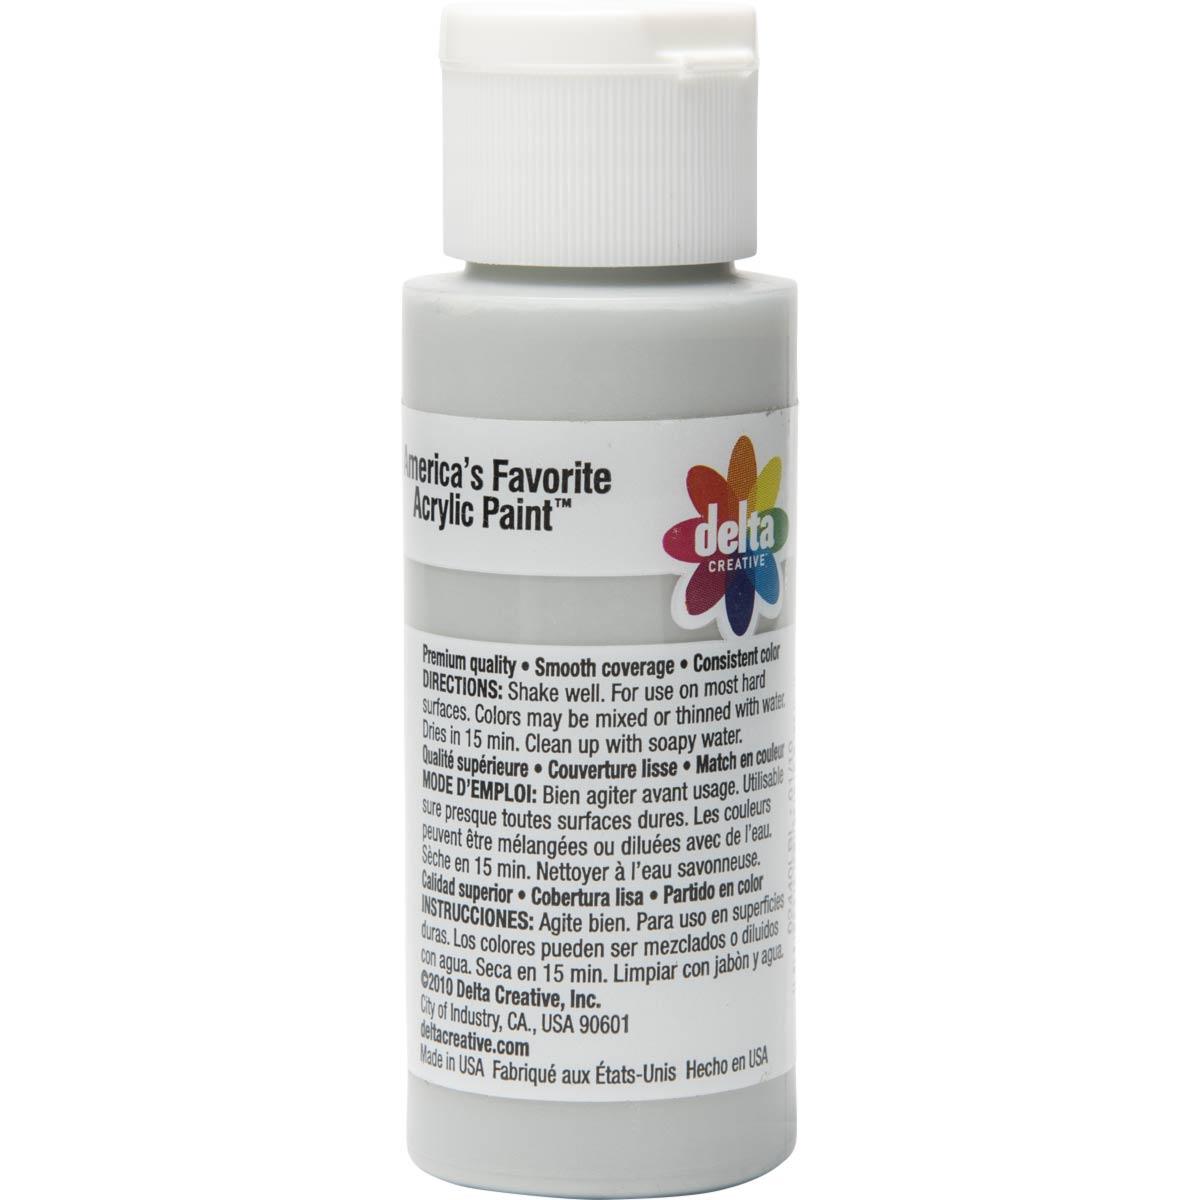 Delta Ceramcoat Acrylic Paint - Bridgeport Grey, 2 oz. - 024400202W